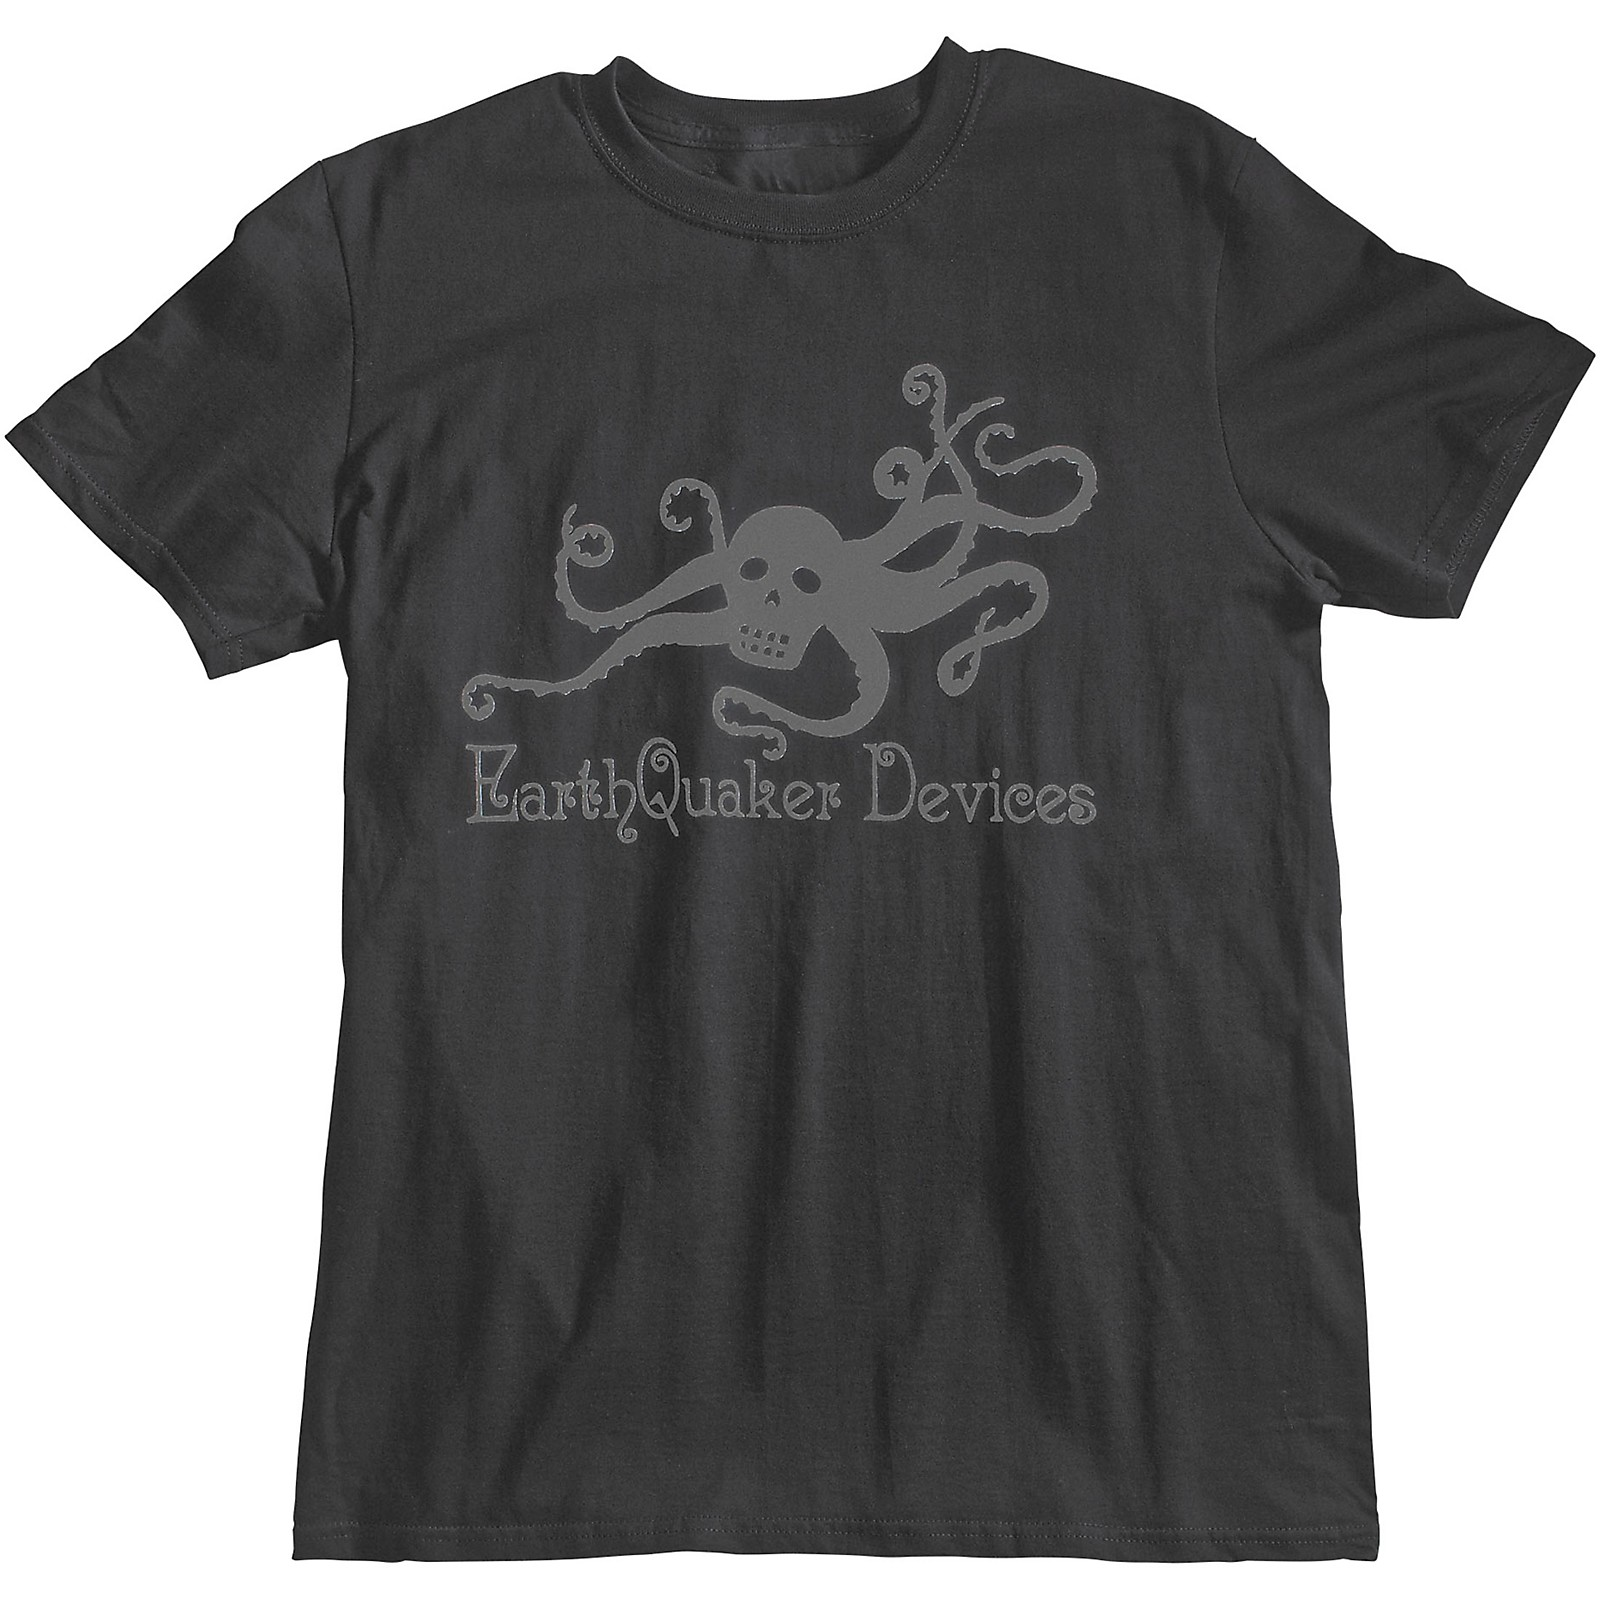 EarthQuaker Devices Octoskull T-Shirt - Asphalt